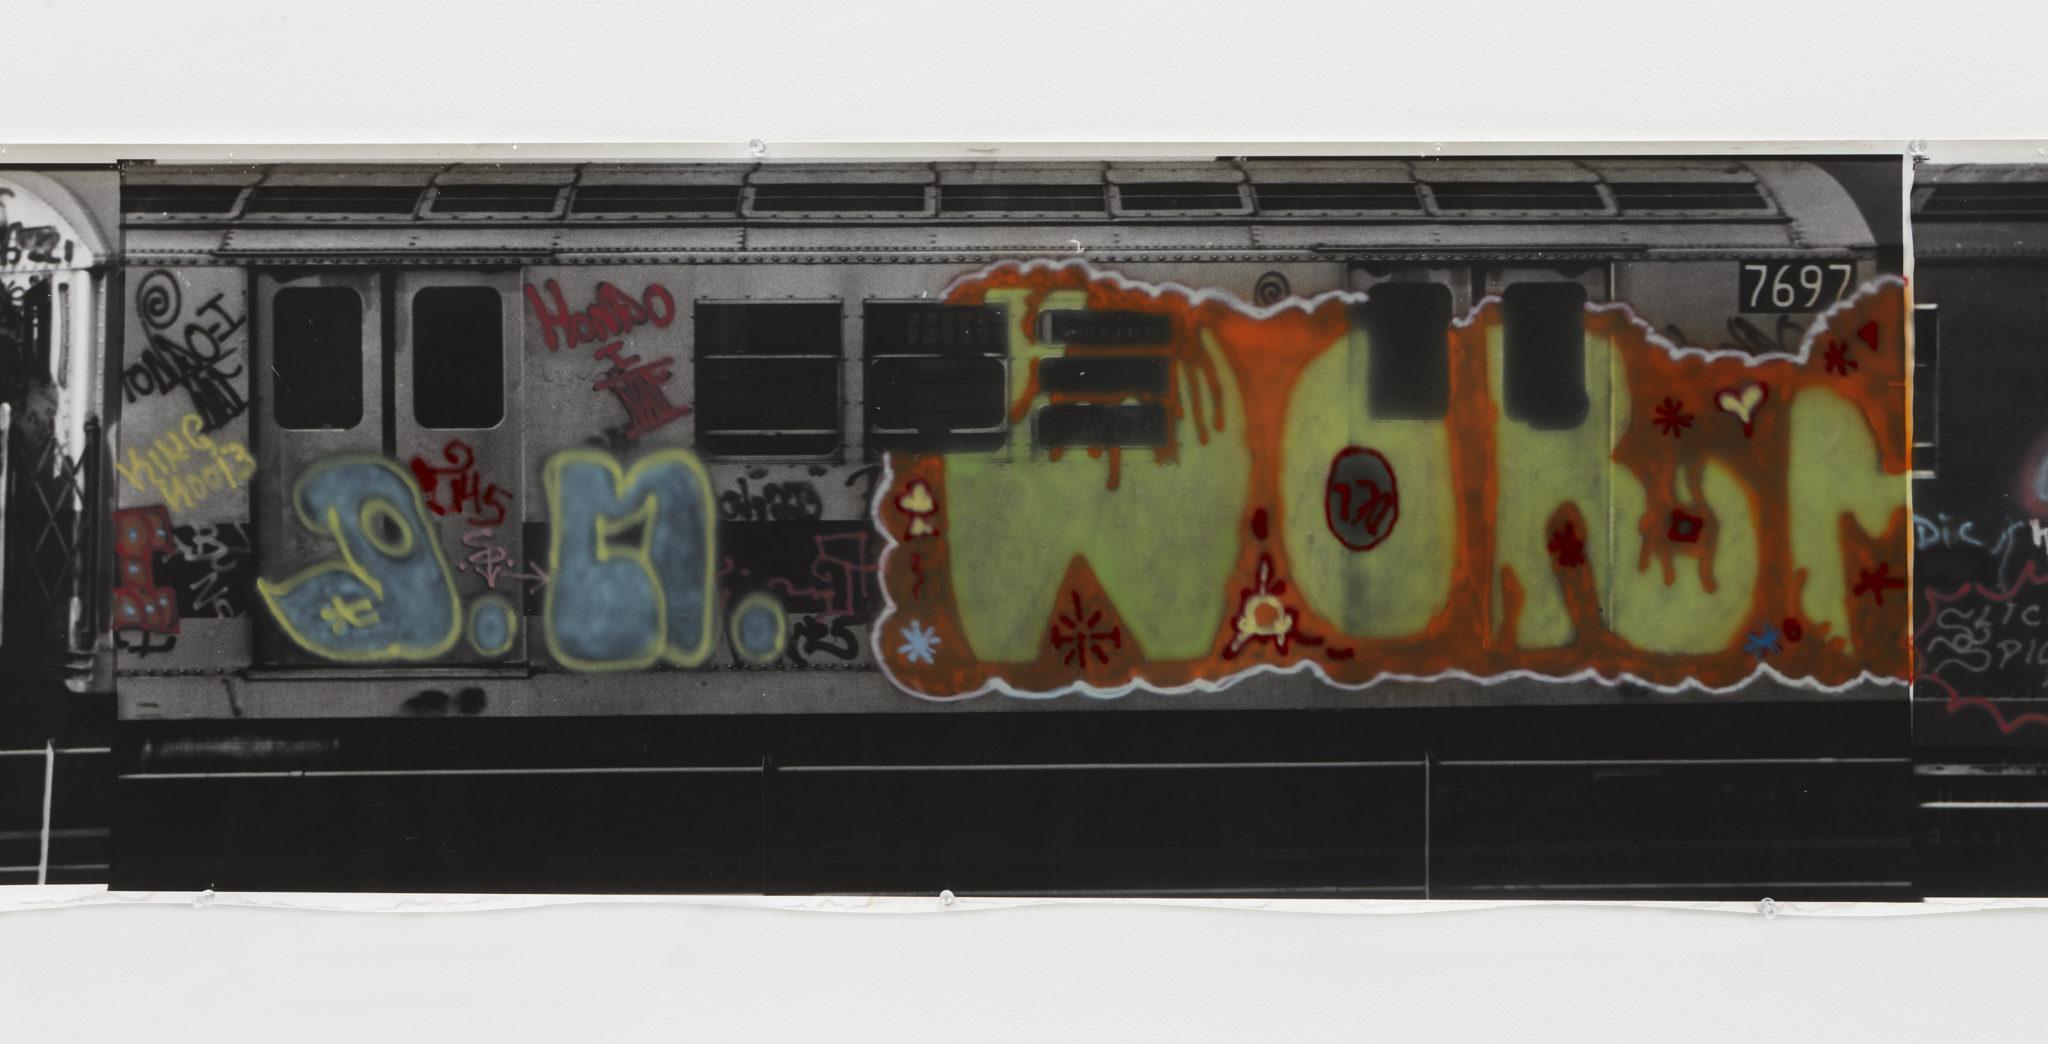 Gordon Matta-Clark Graffiti, 1975 Courtesy The Estate of Gordon Matta-Clark et David Zwirner, New York / Londres / Hong Kong. © 2018 The Estate of Gordon Matta-Clark / ADAGP, Paris